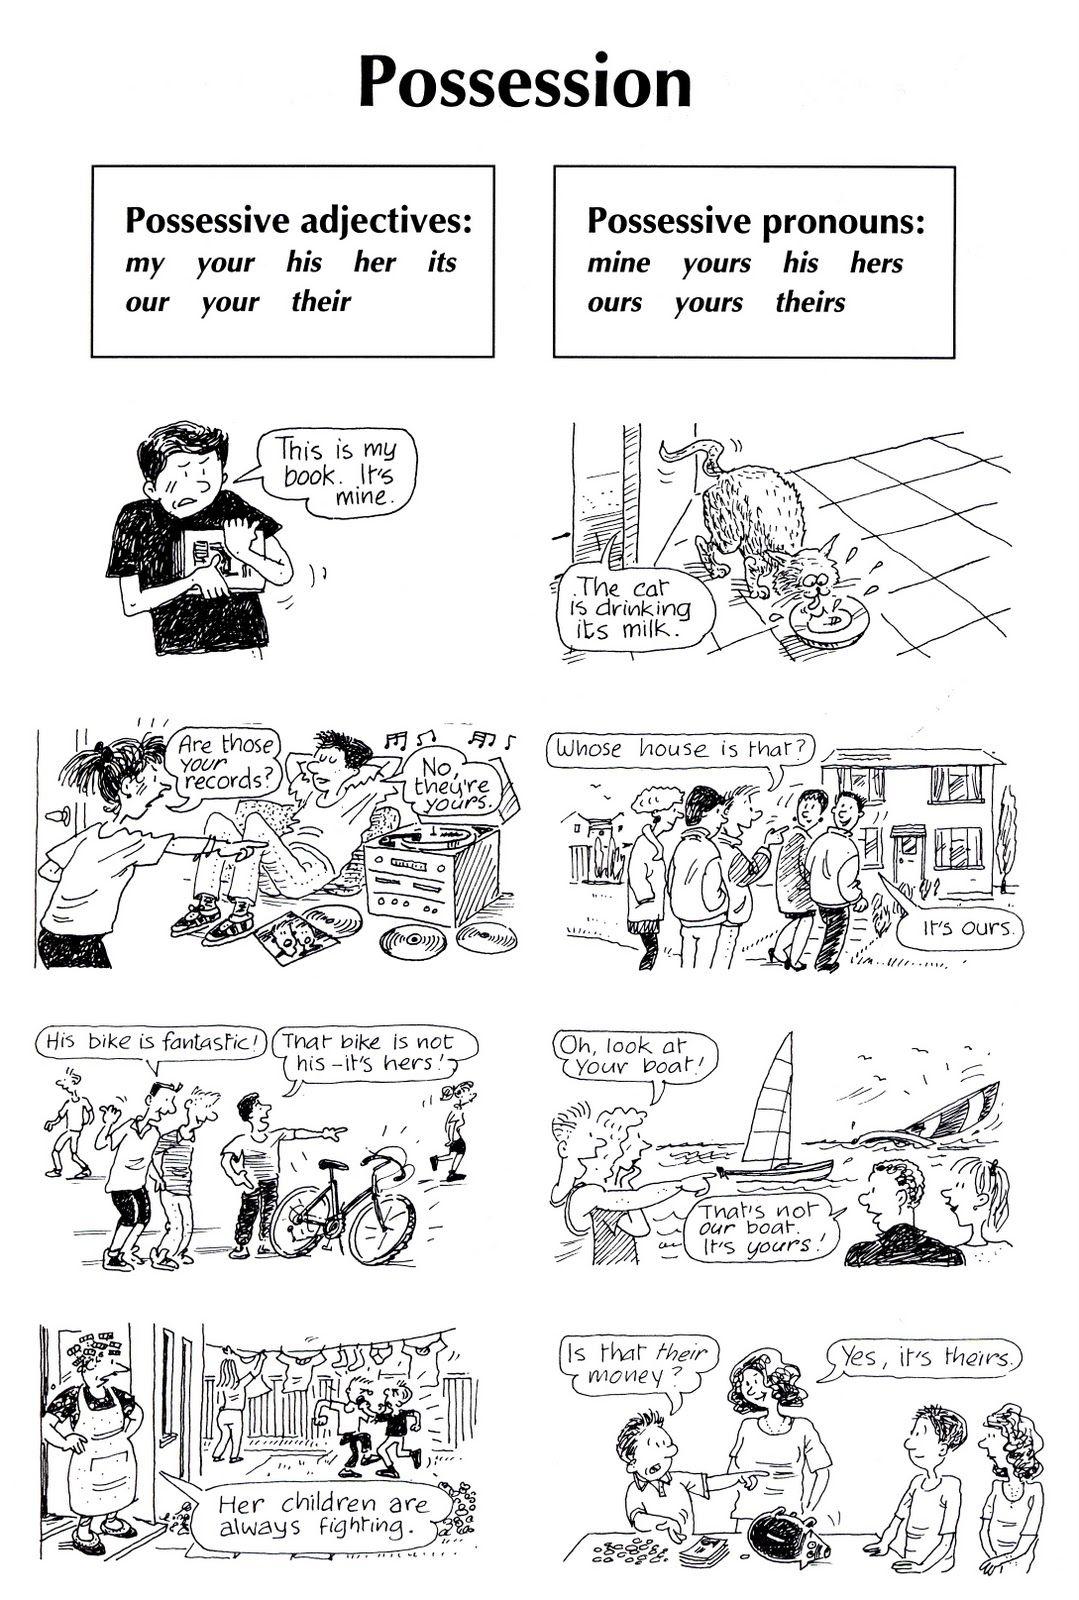 Possessive Adjectives Possessive Pronouns Worksheets Pinterest